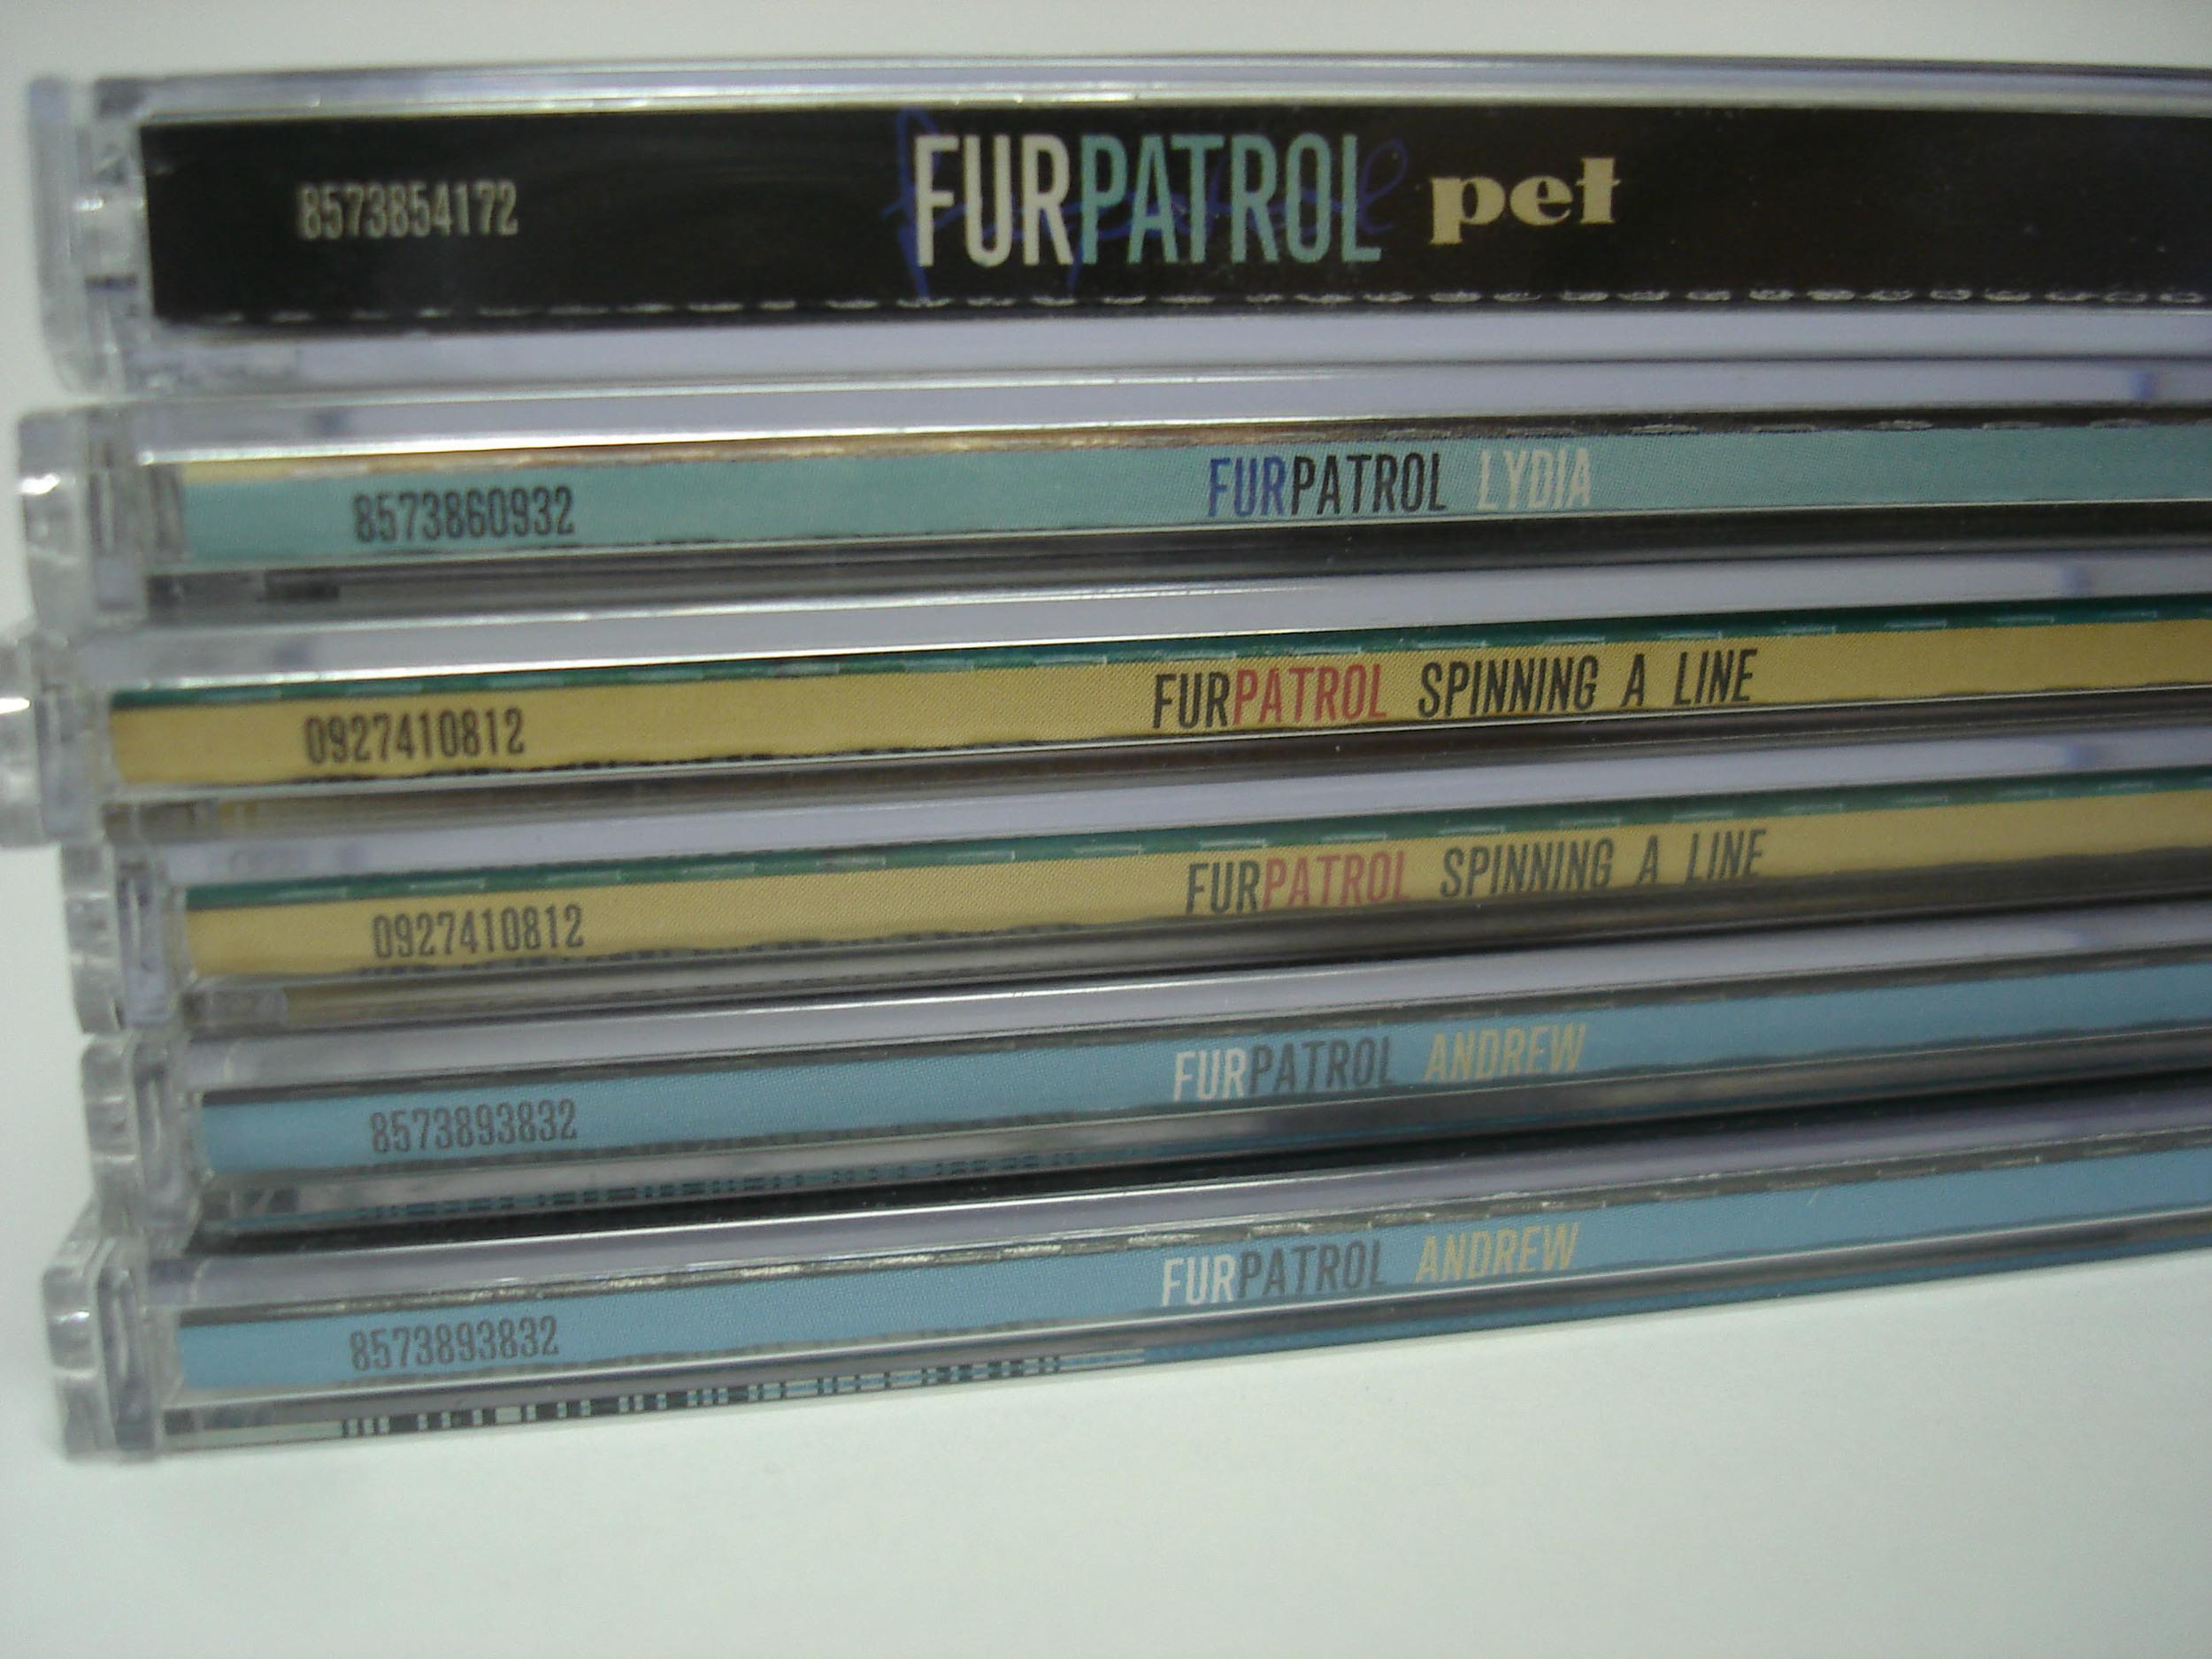 FUR PATROL - ALBUMS AND SINGLES